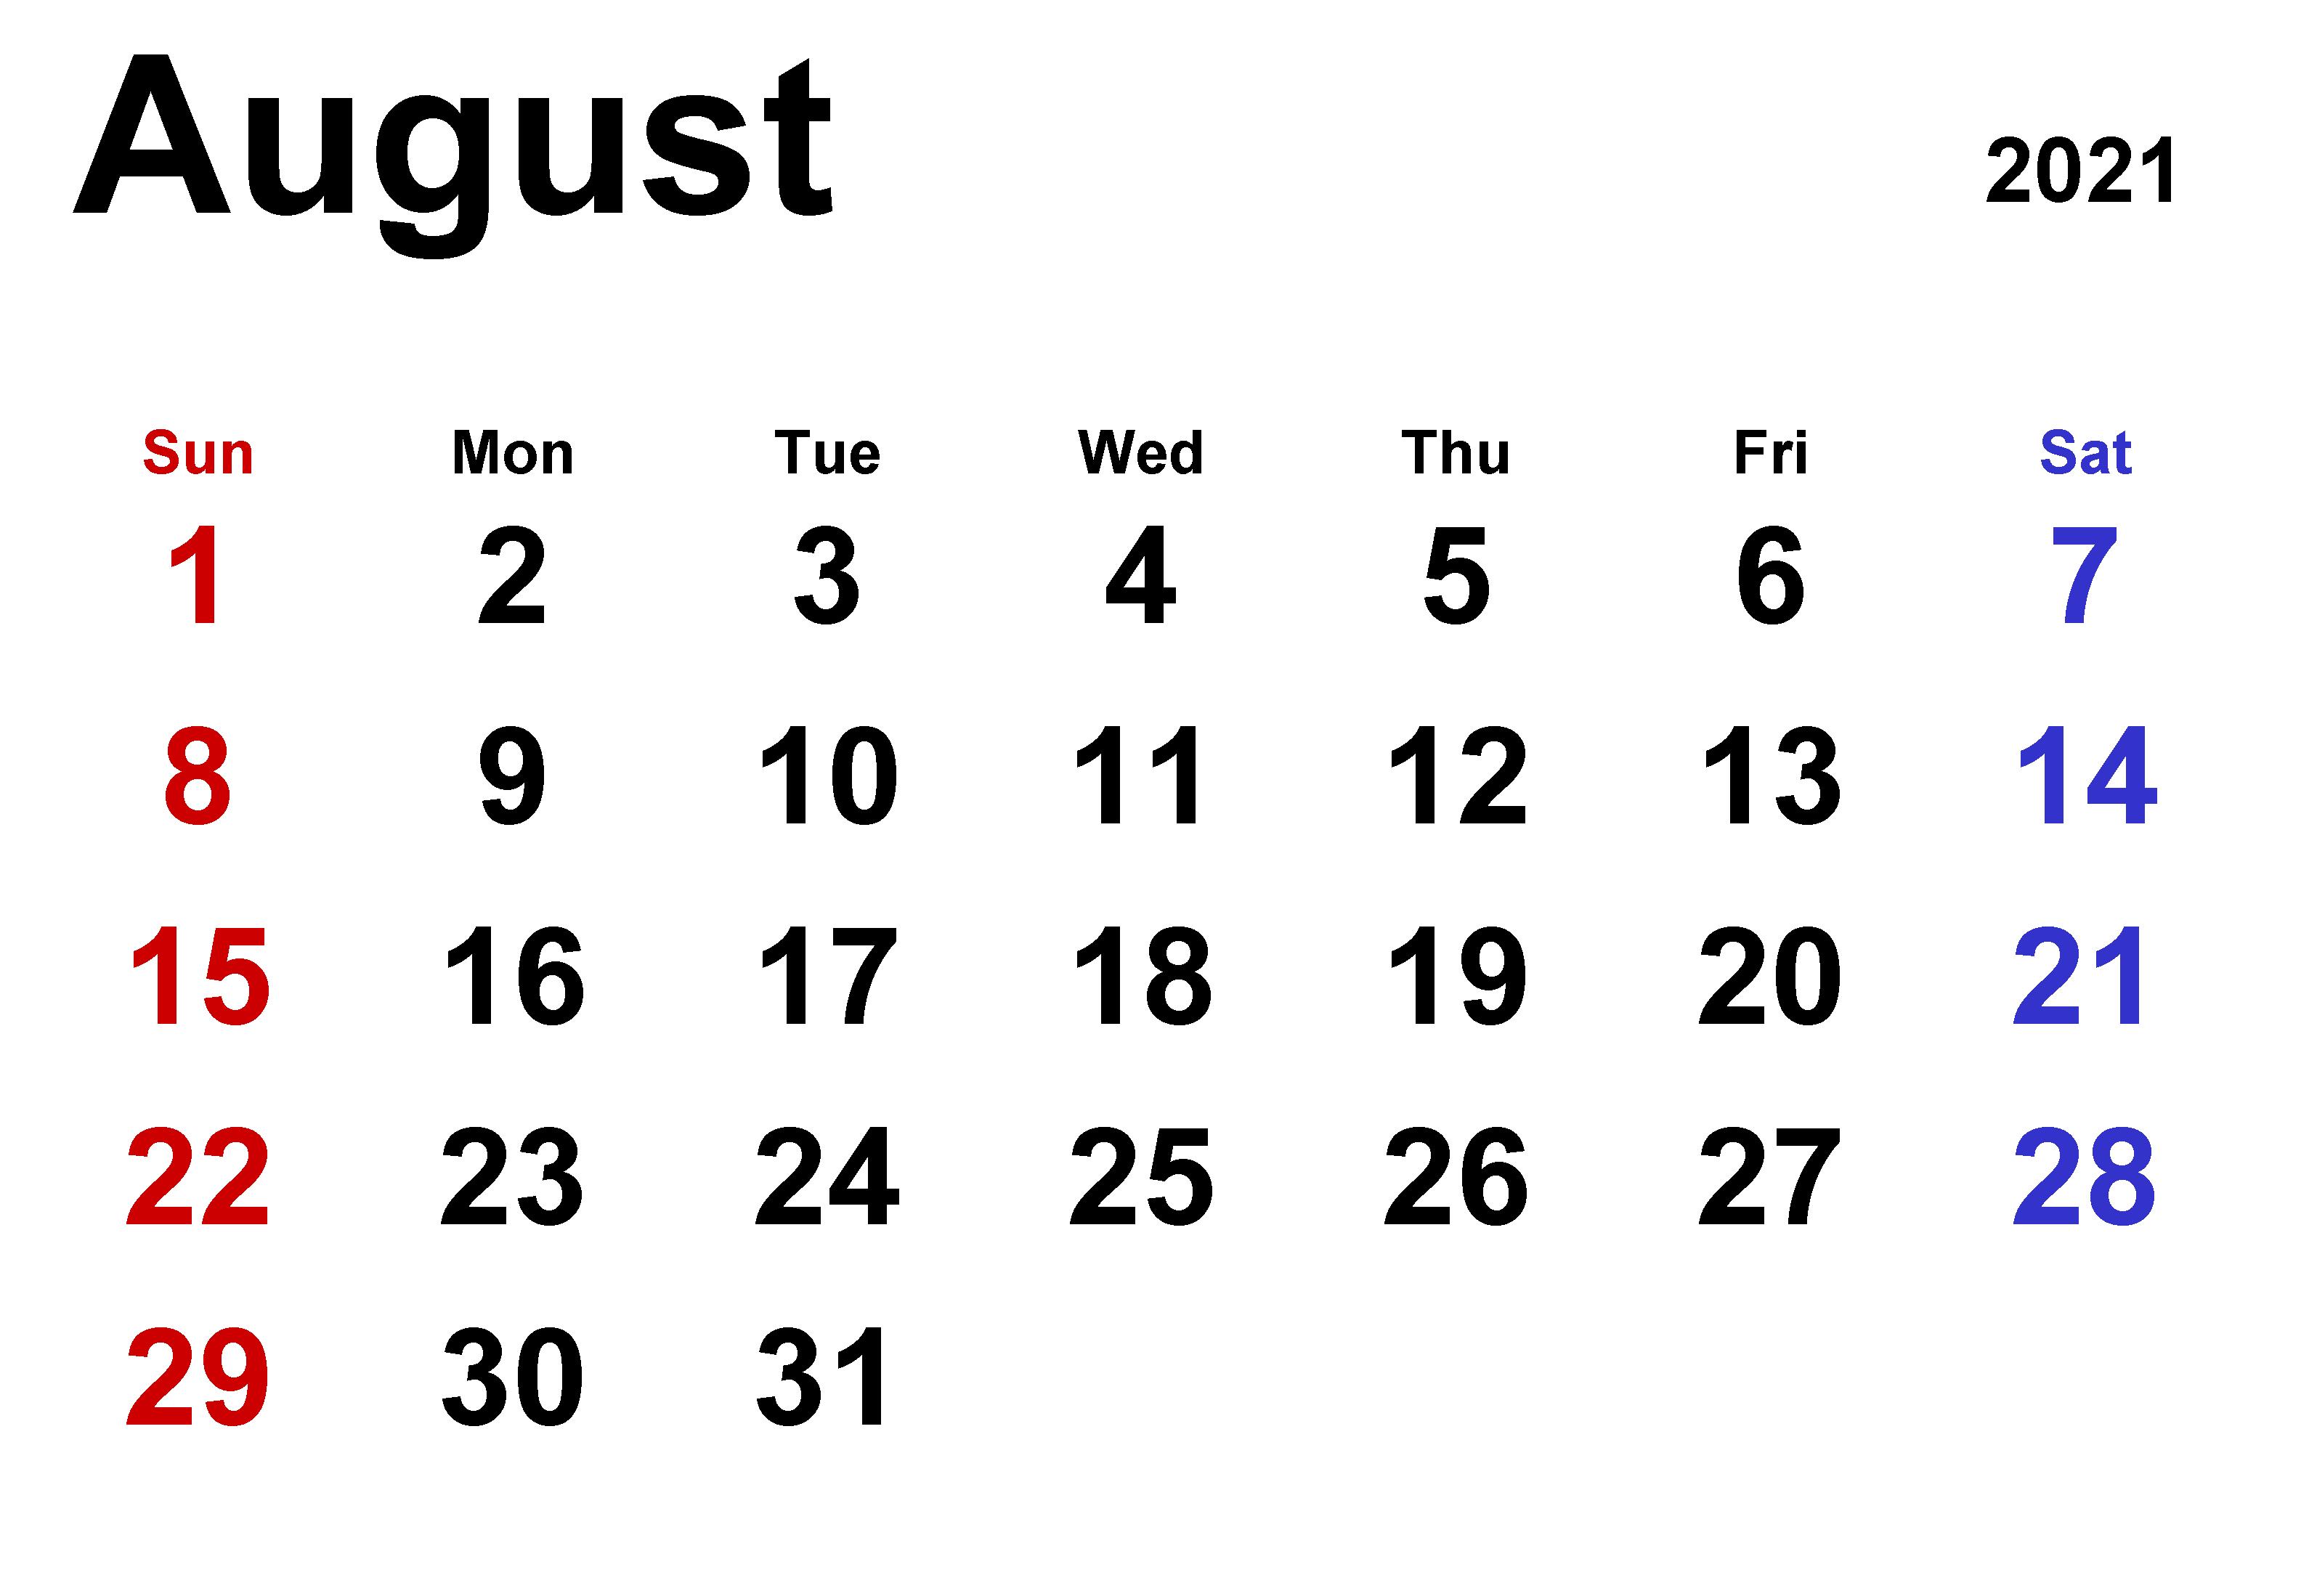 Fillable August 2021 Calendar Printable